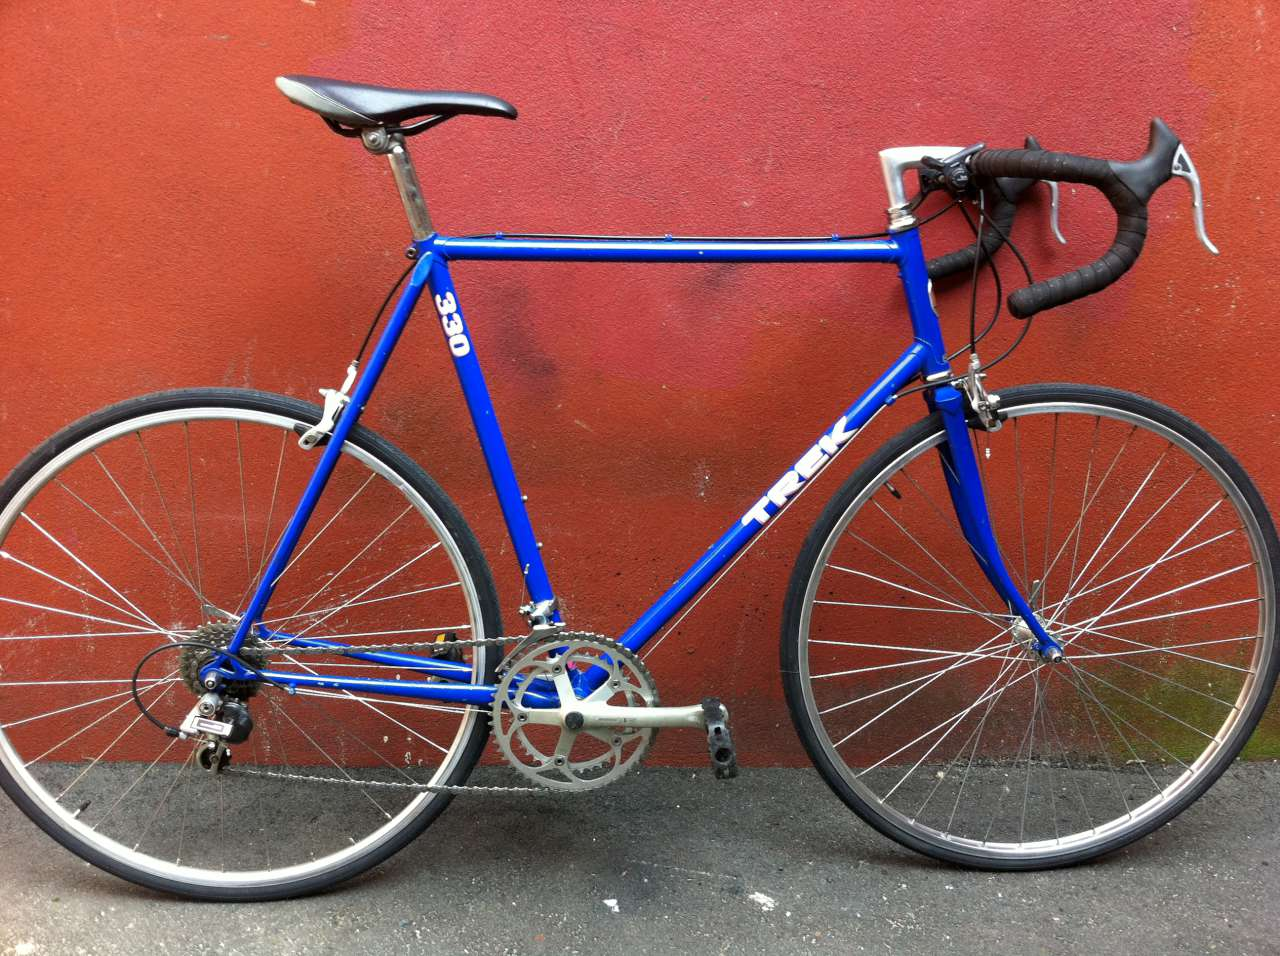 Bike Boom Refurbished Bikes 1990 Trek 330